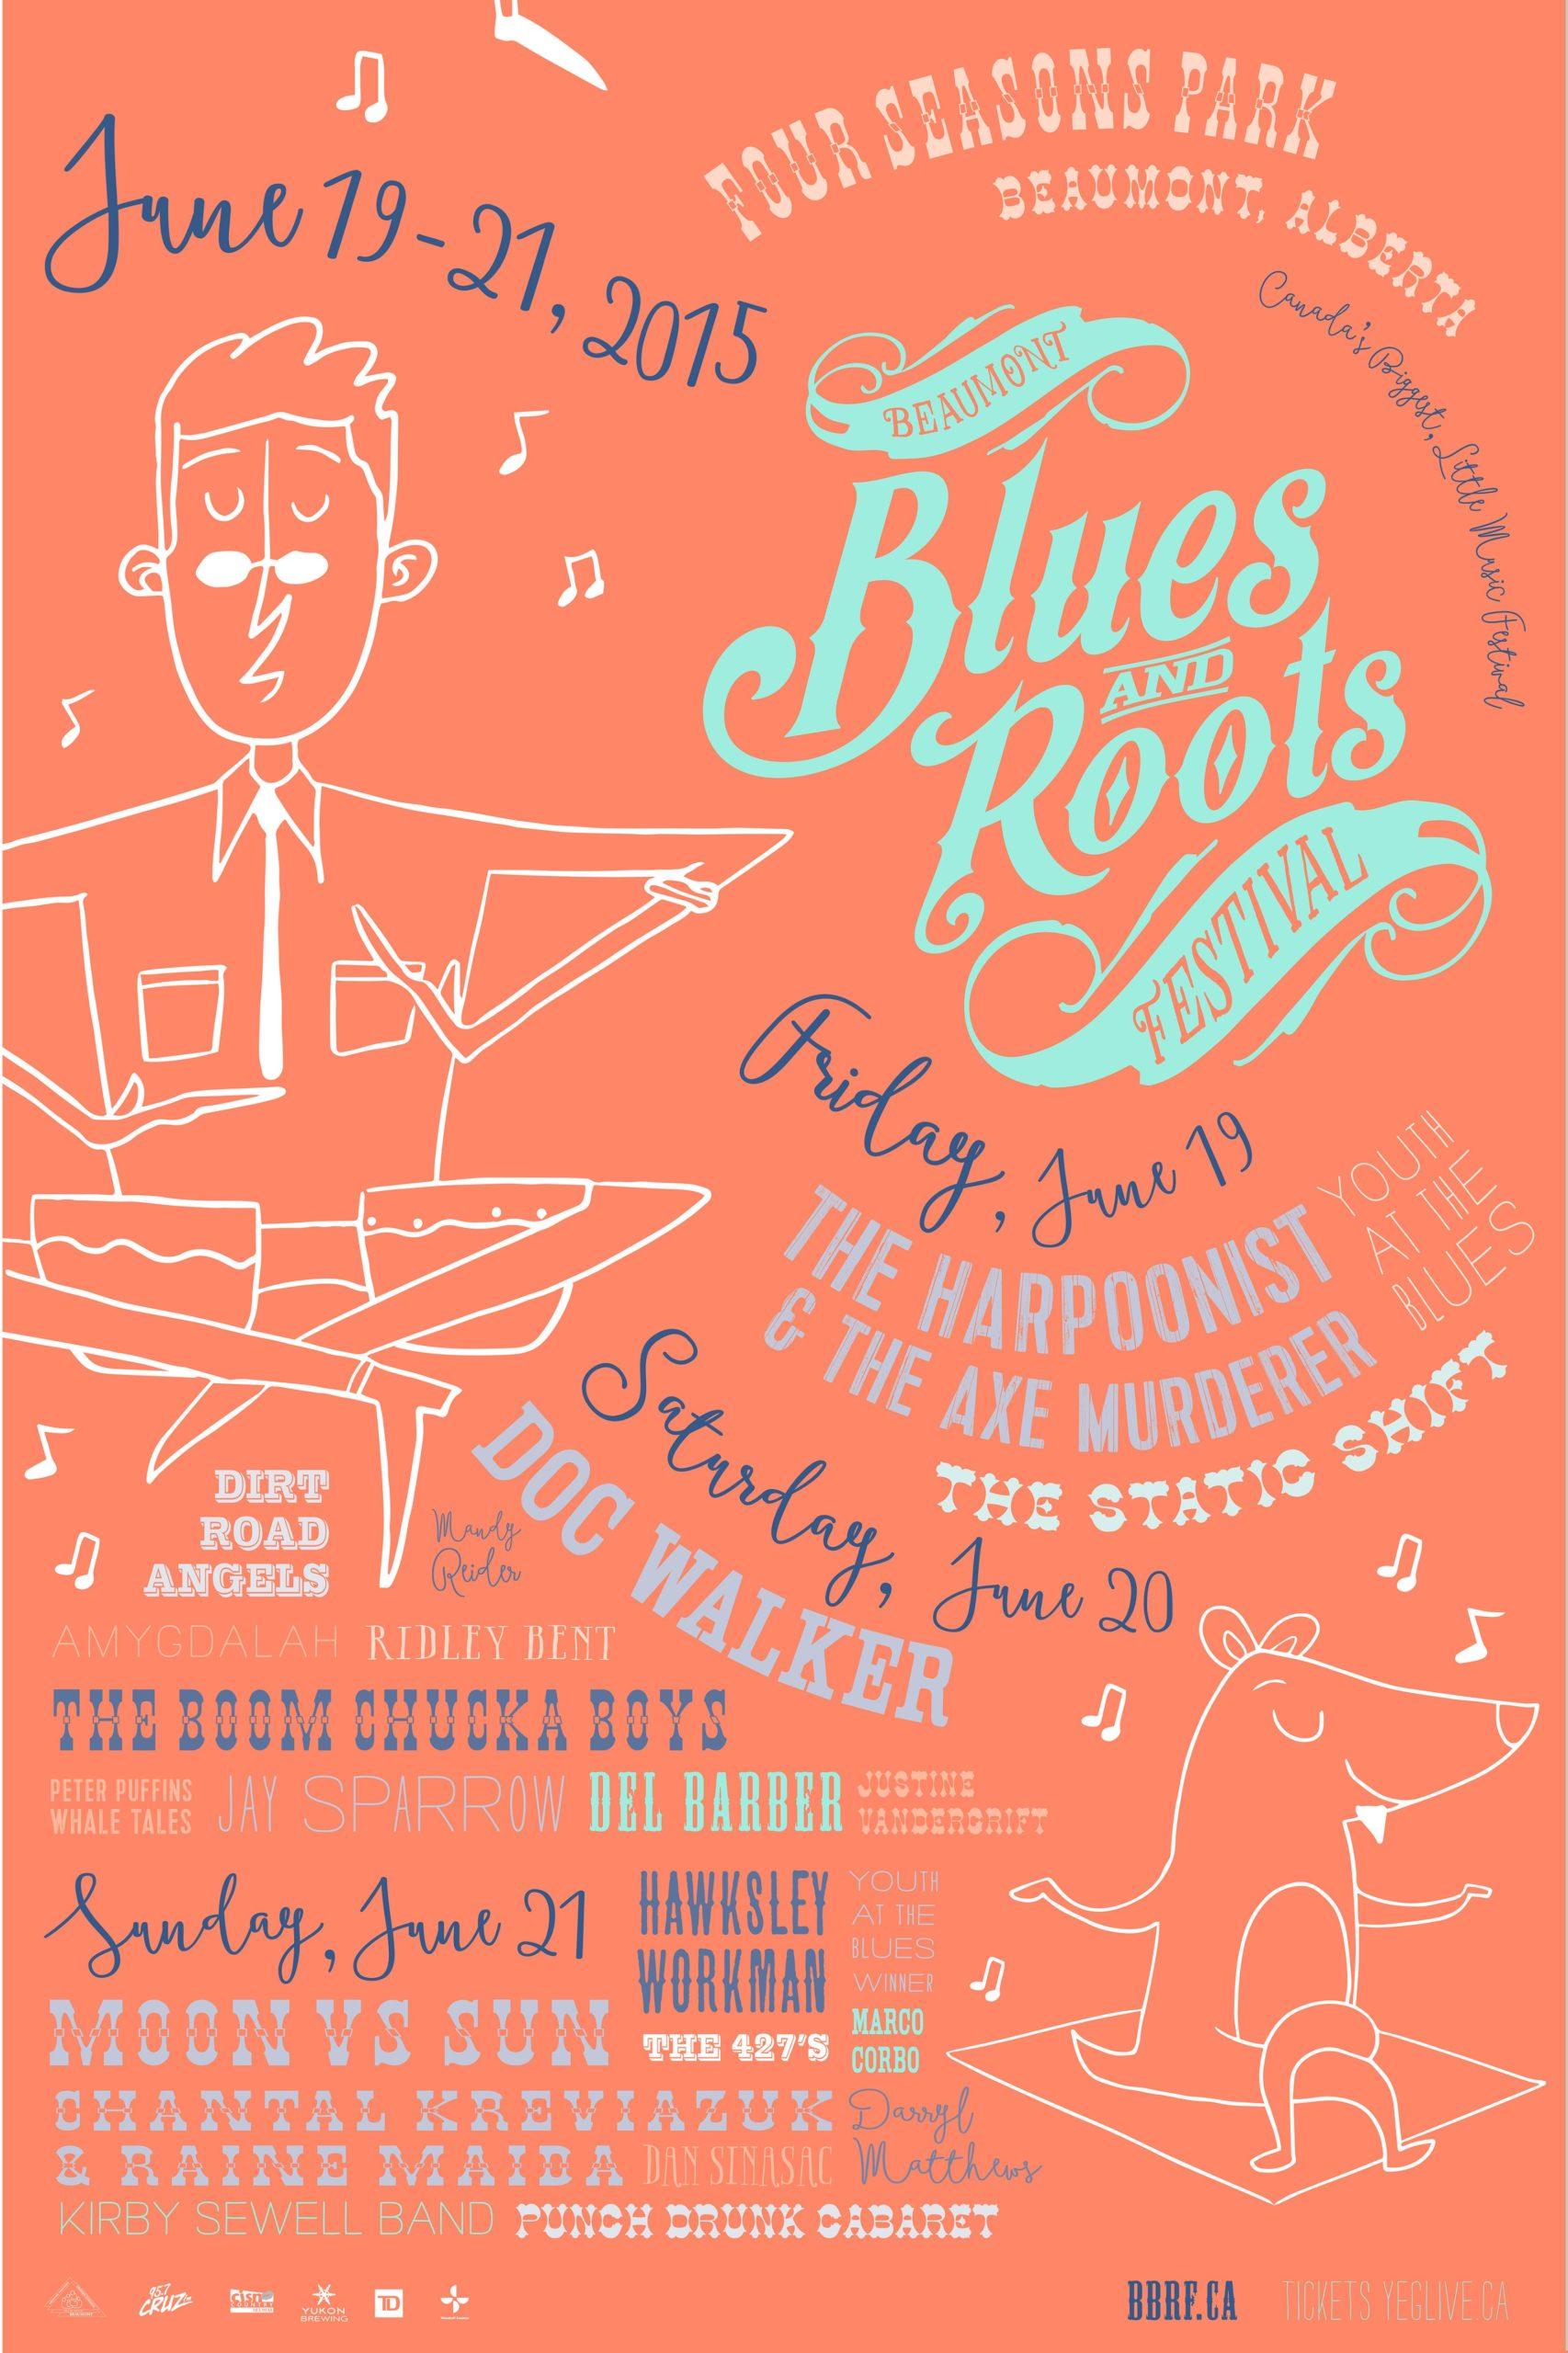 The Beaumont Blues & Roots Festival poster 2015 orange